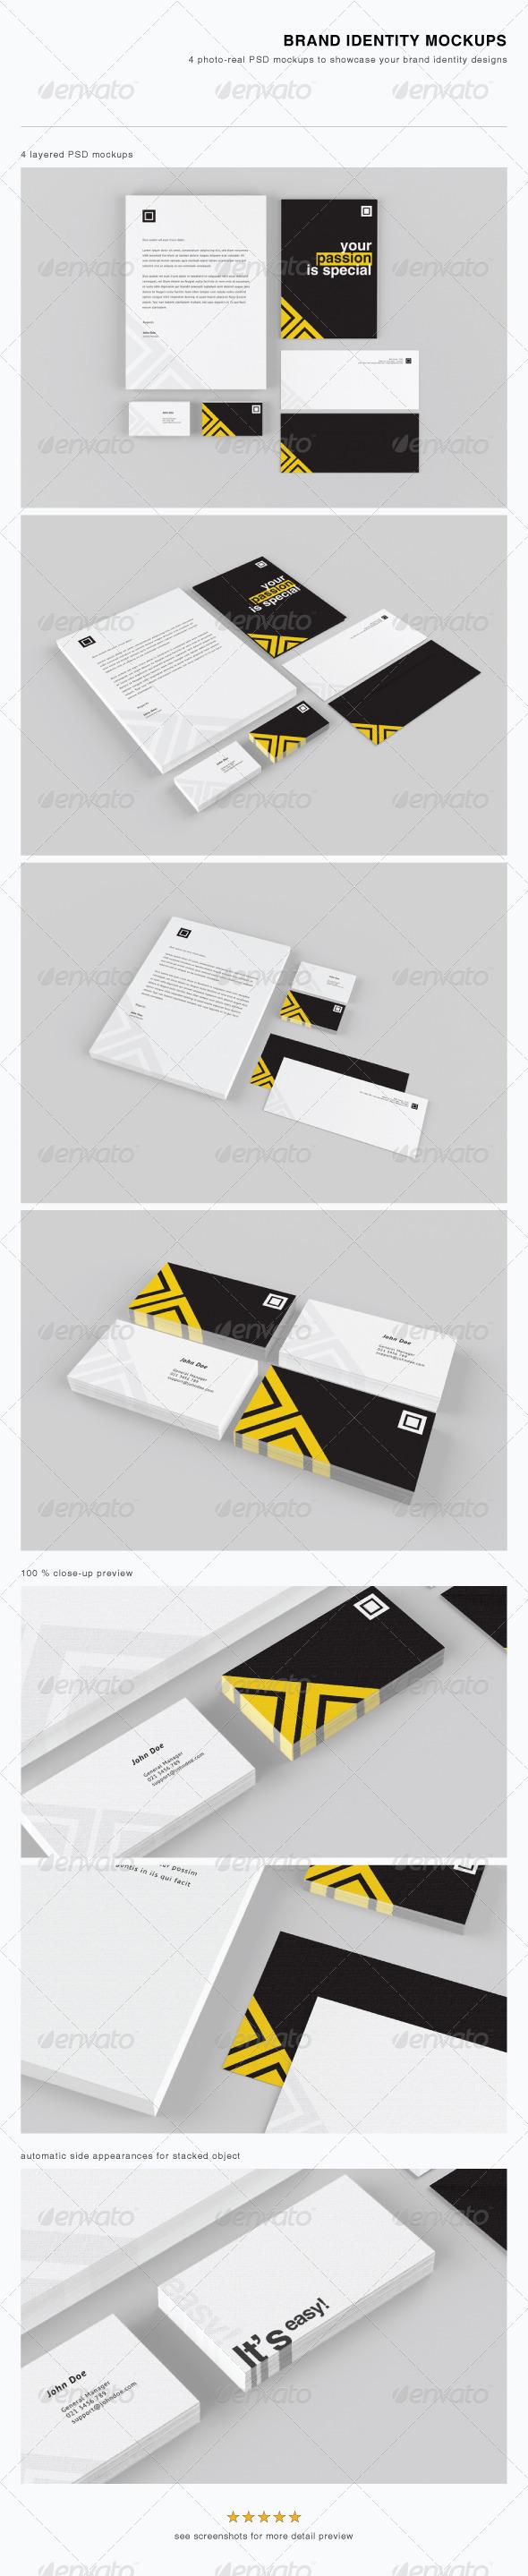 GraphicRiver Brand Identity Mockups 3208794